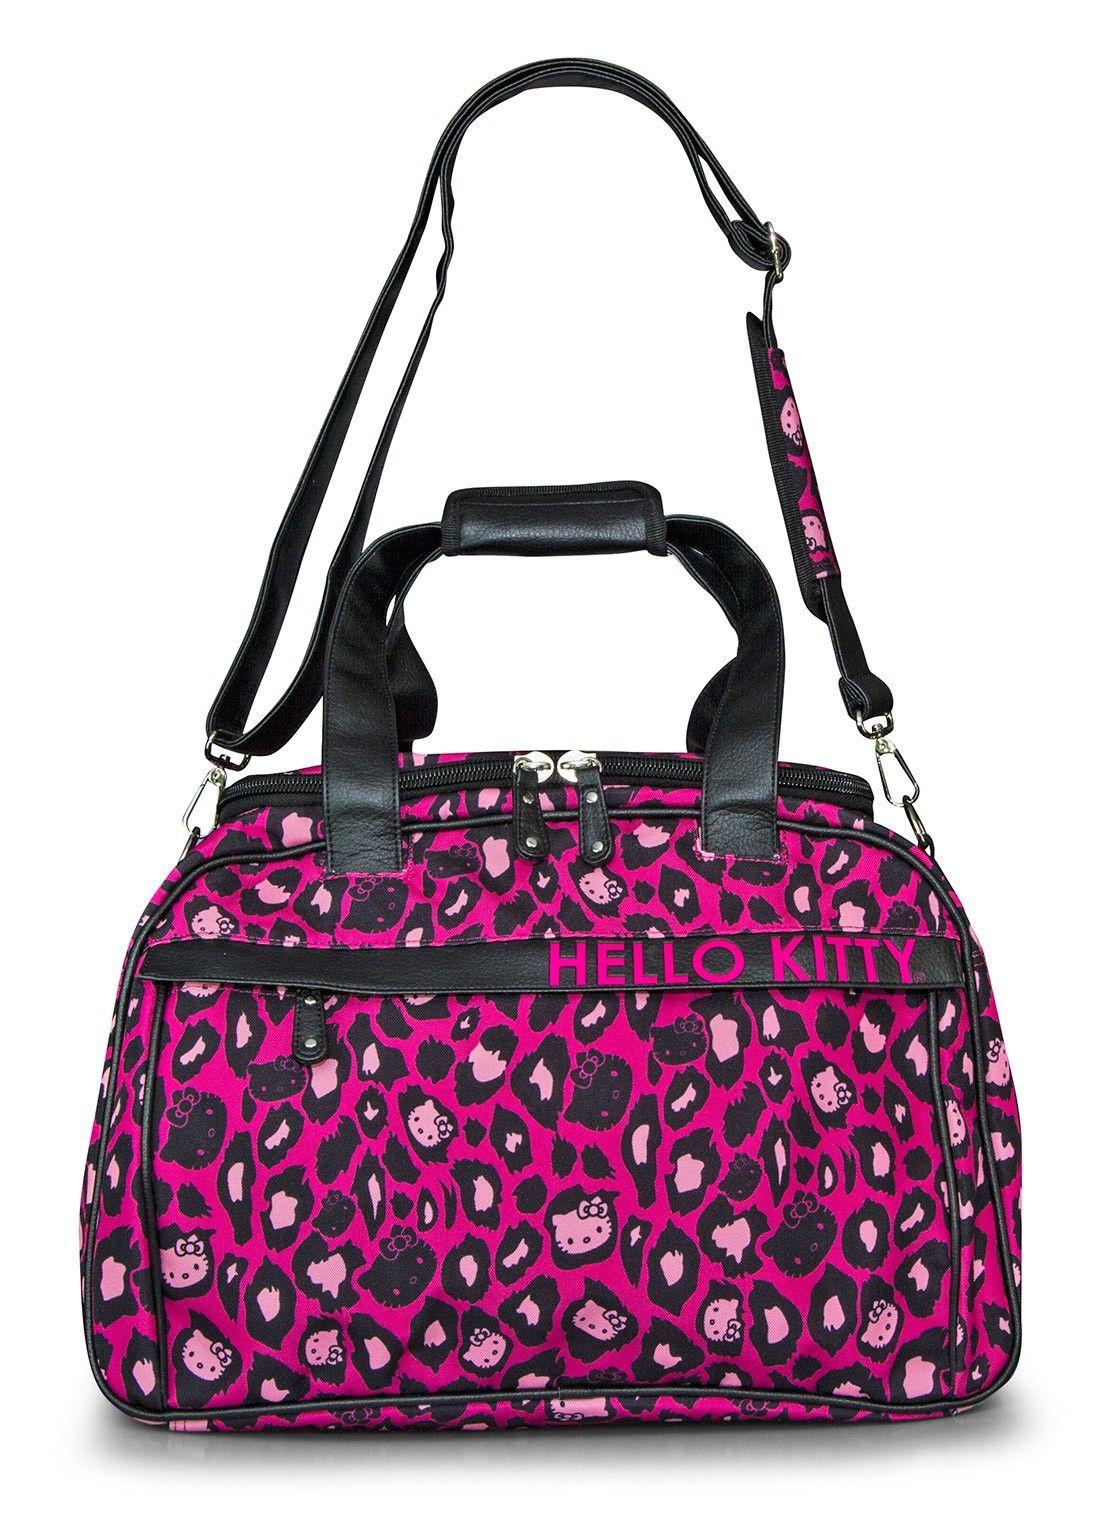 5211b1c5cf Hello Kitty Pink Leopard Print Duffle - Travel Bags Luggage - Bags ...